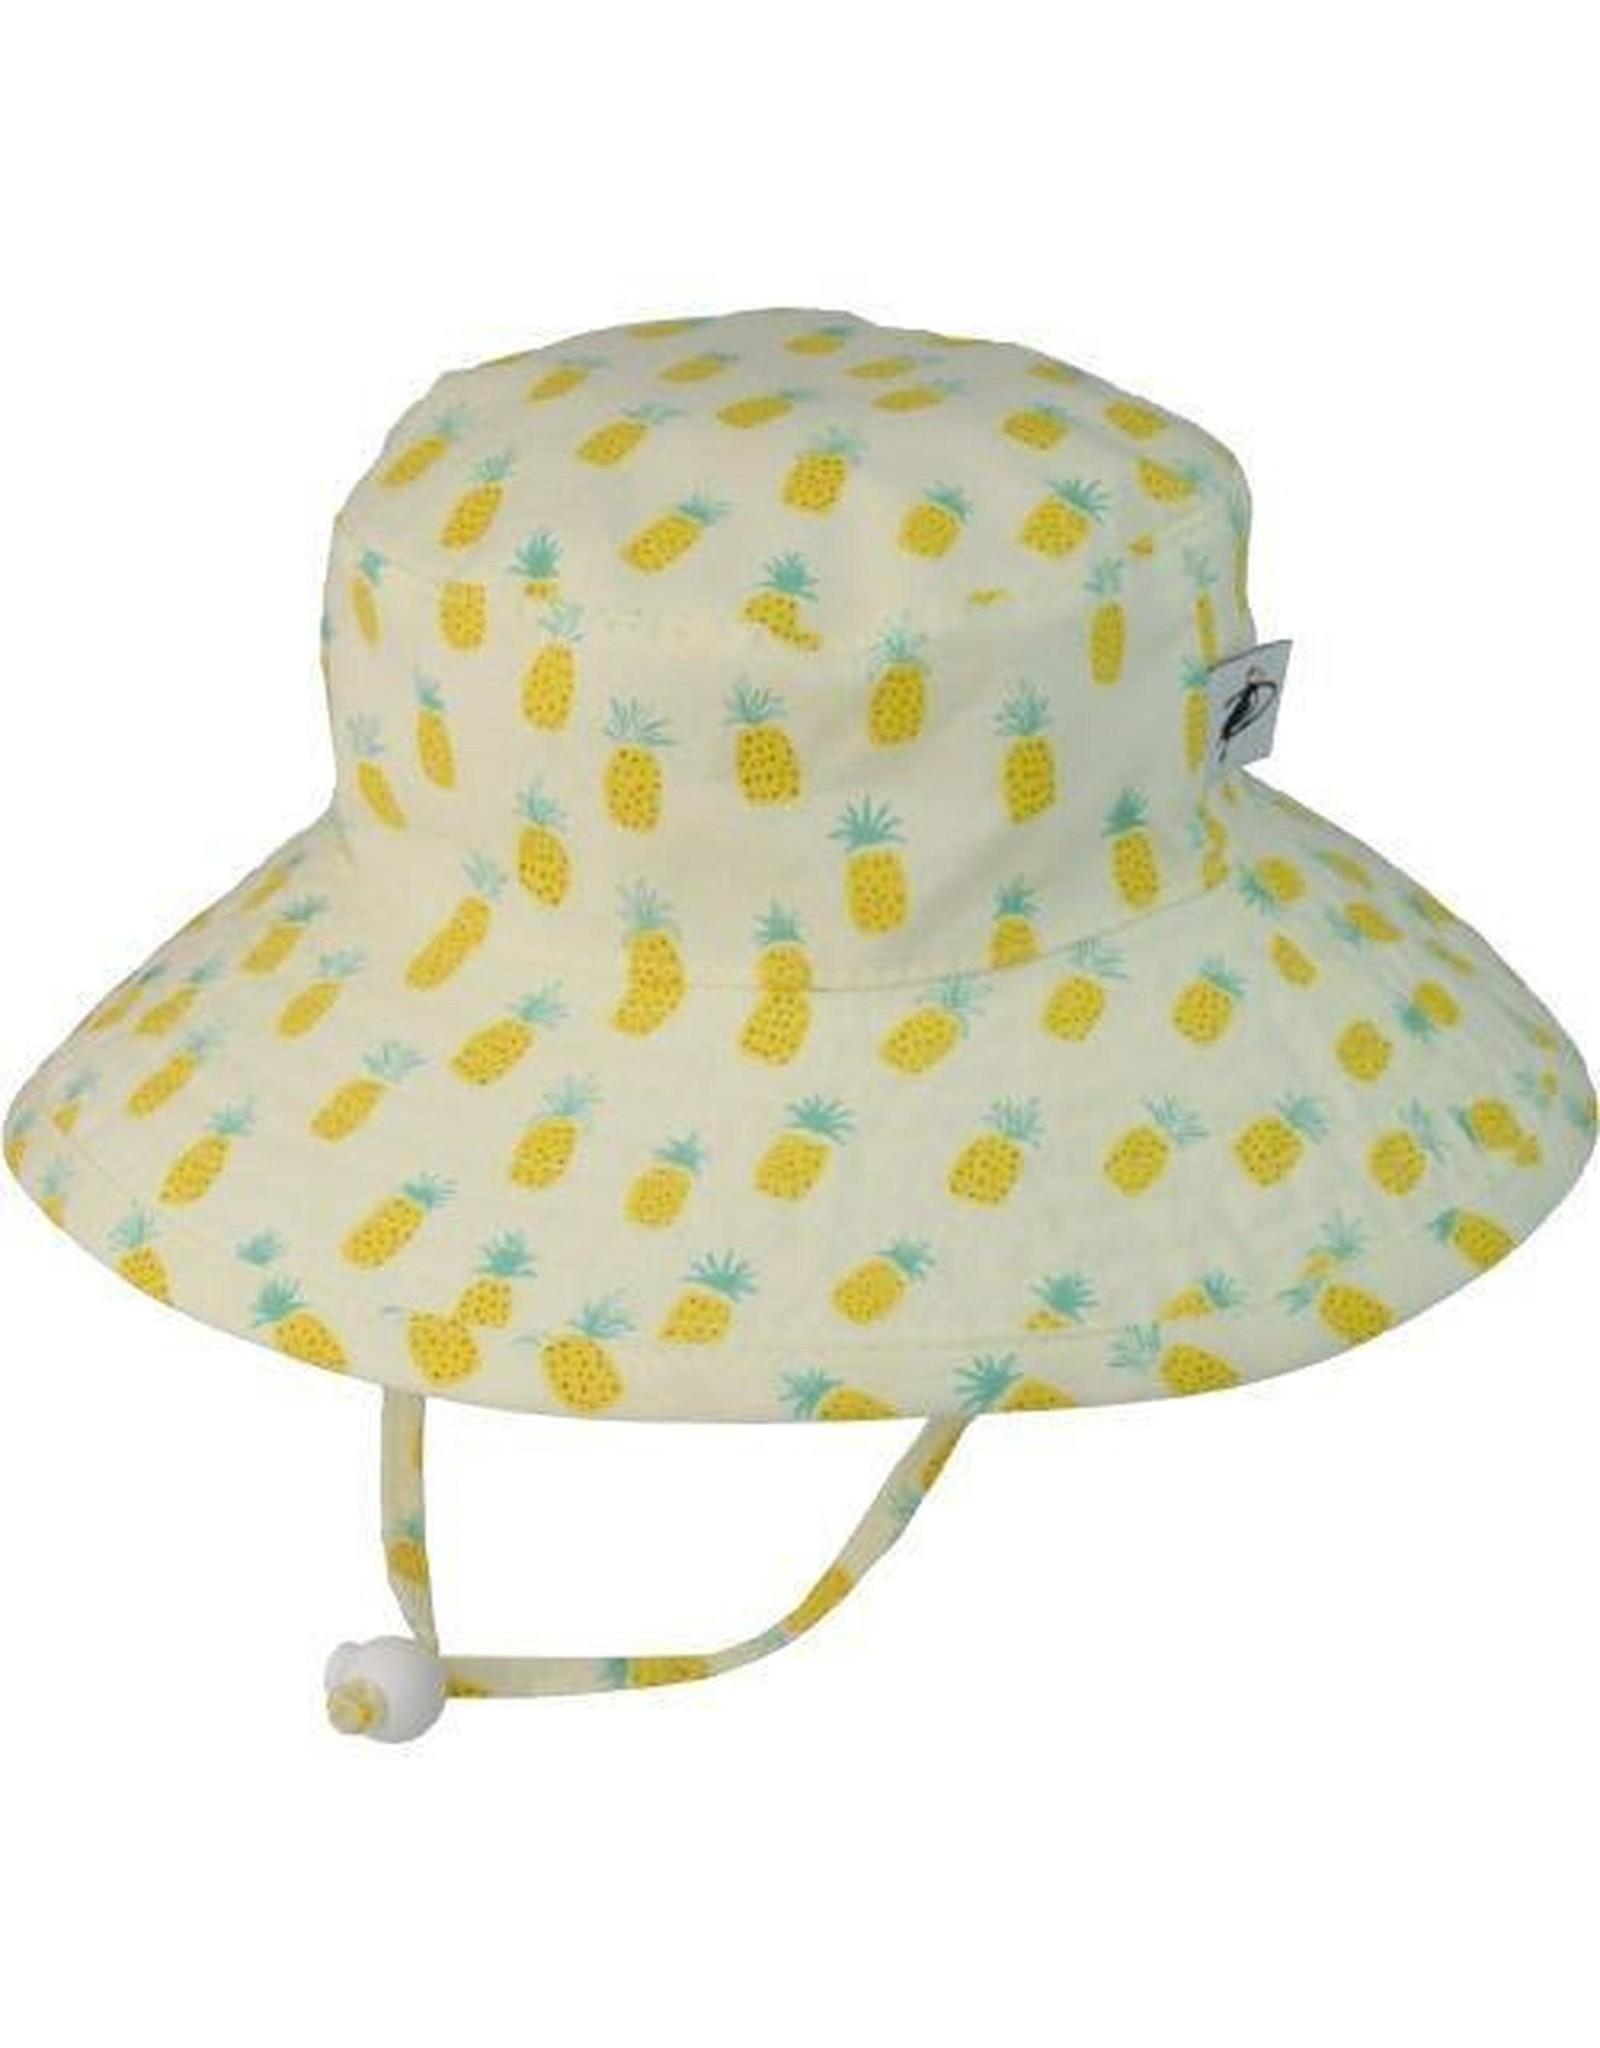 Puffin Gear Sunbaby Hat, Pineapple, 6-12 months